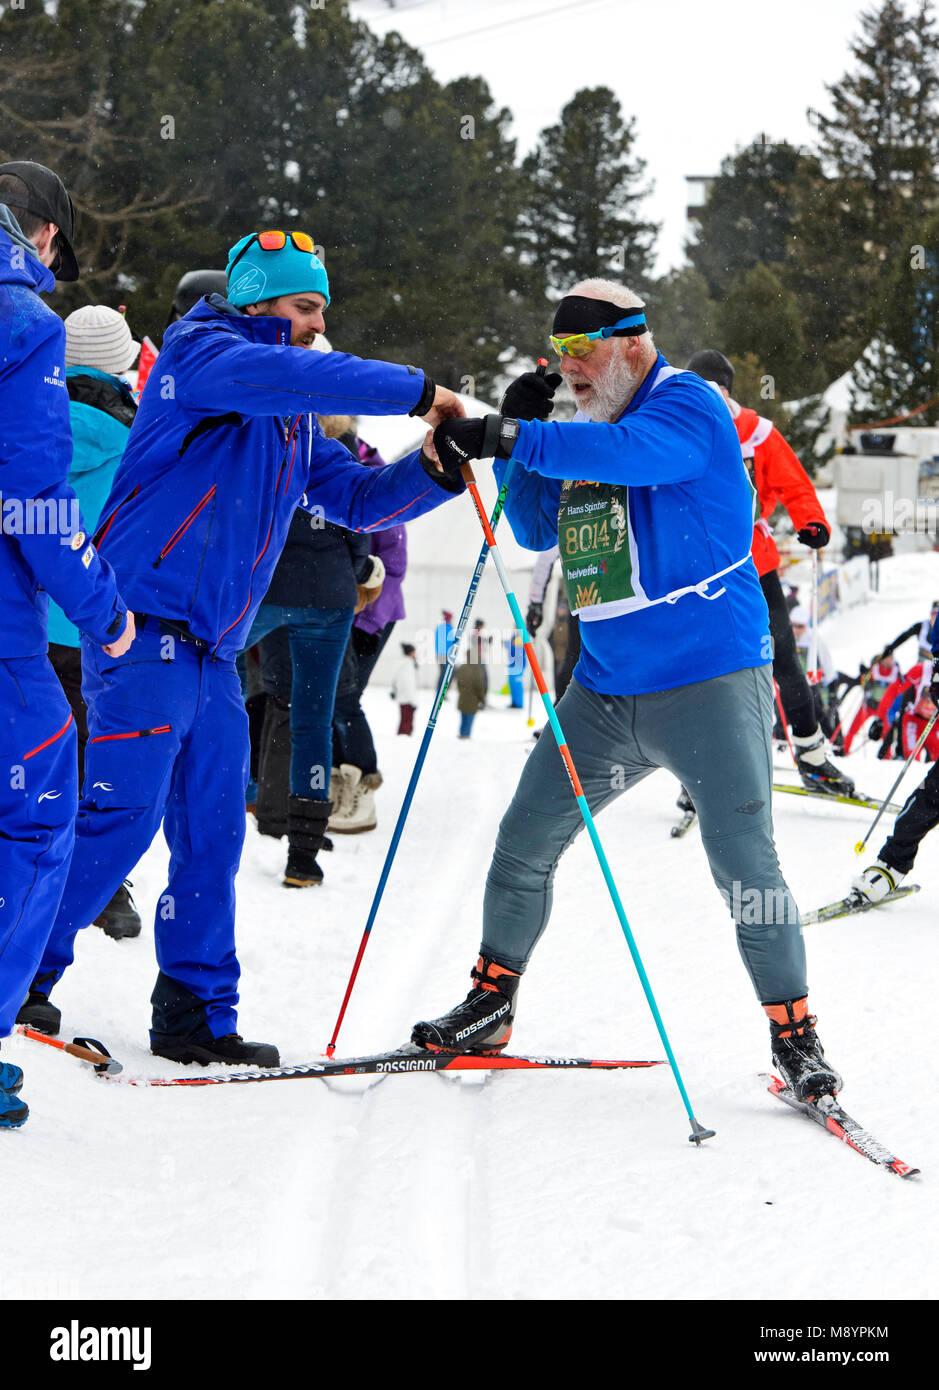 Esquiador de fondo con un palo roto se da asistencia, Engadin Skimarathon, 11 de marzo de 2018, San Moritz, Suiza Foto de stock